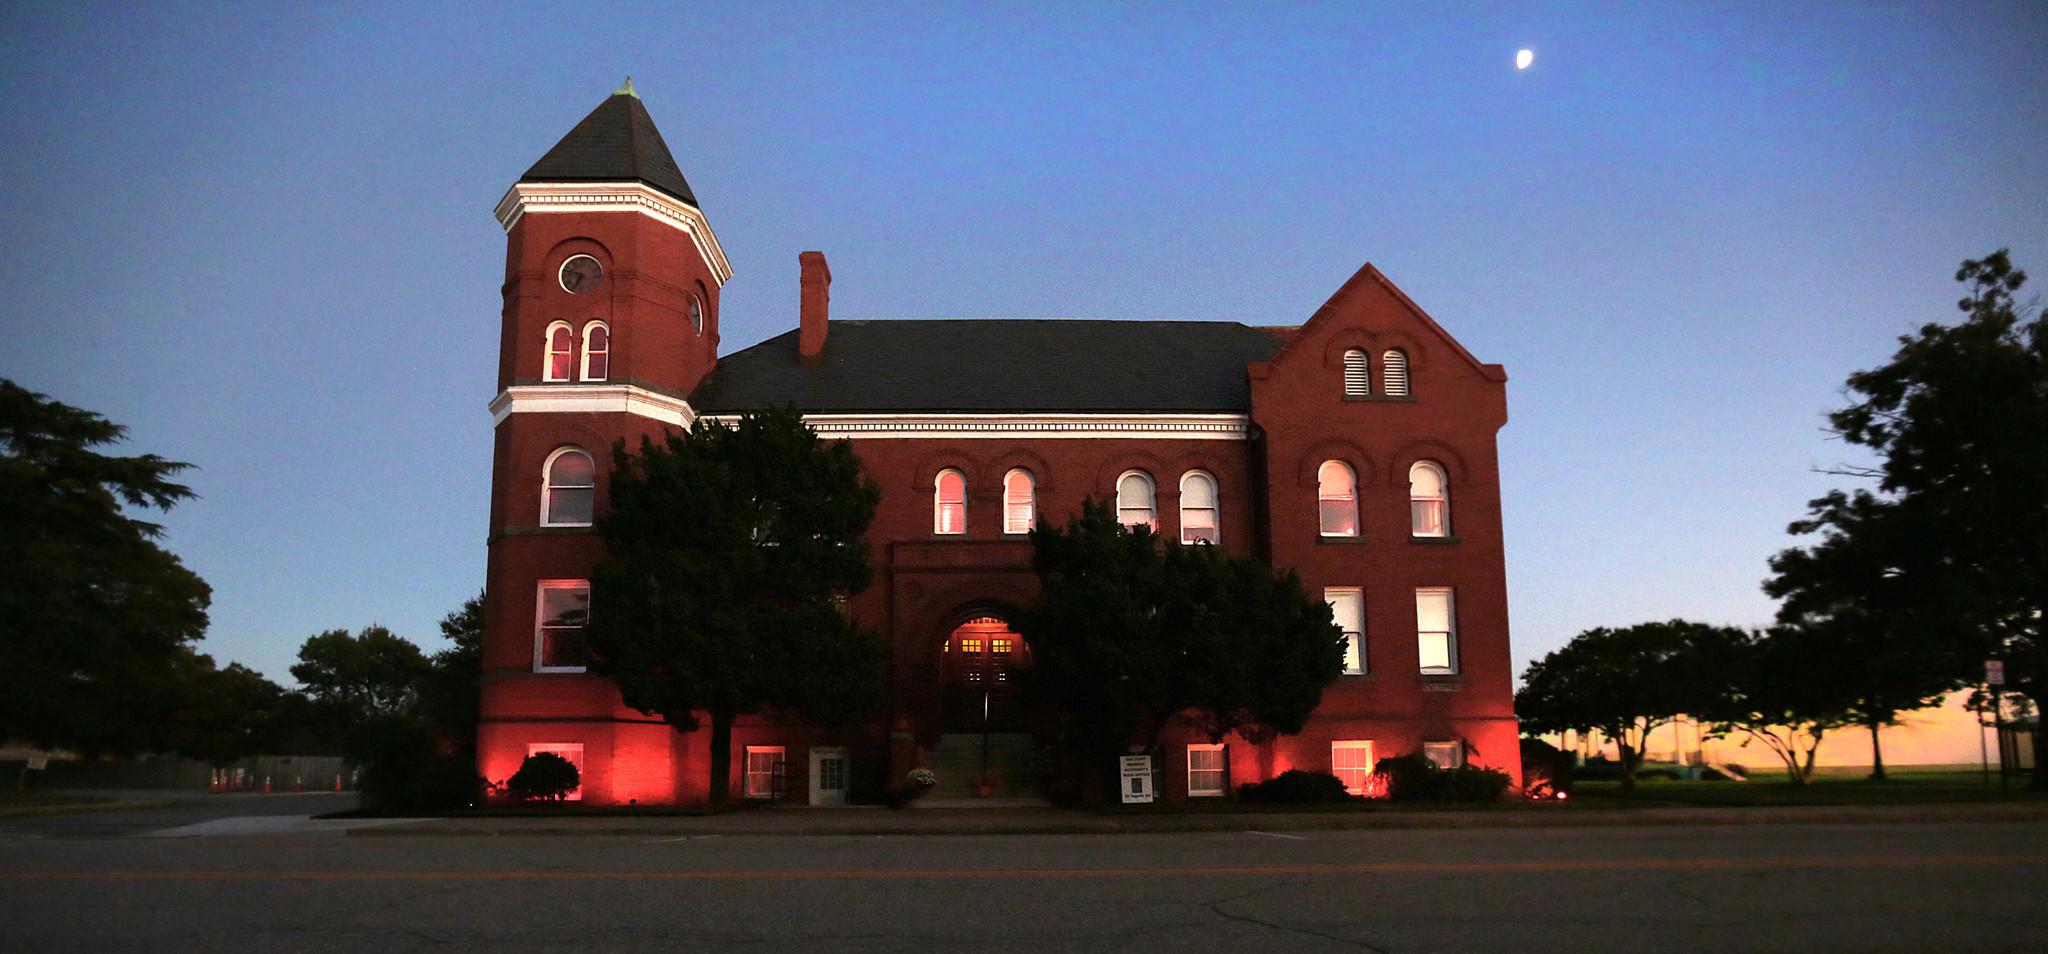 206915d3d08 Local events explore the horrors of Hampton Roads  history - Daily Press